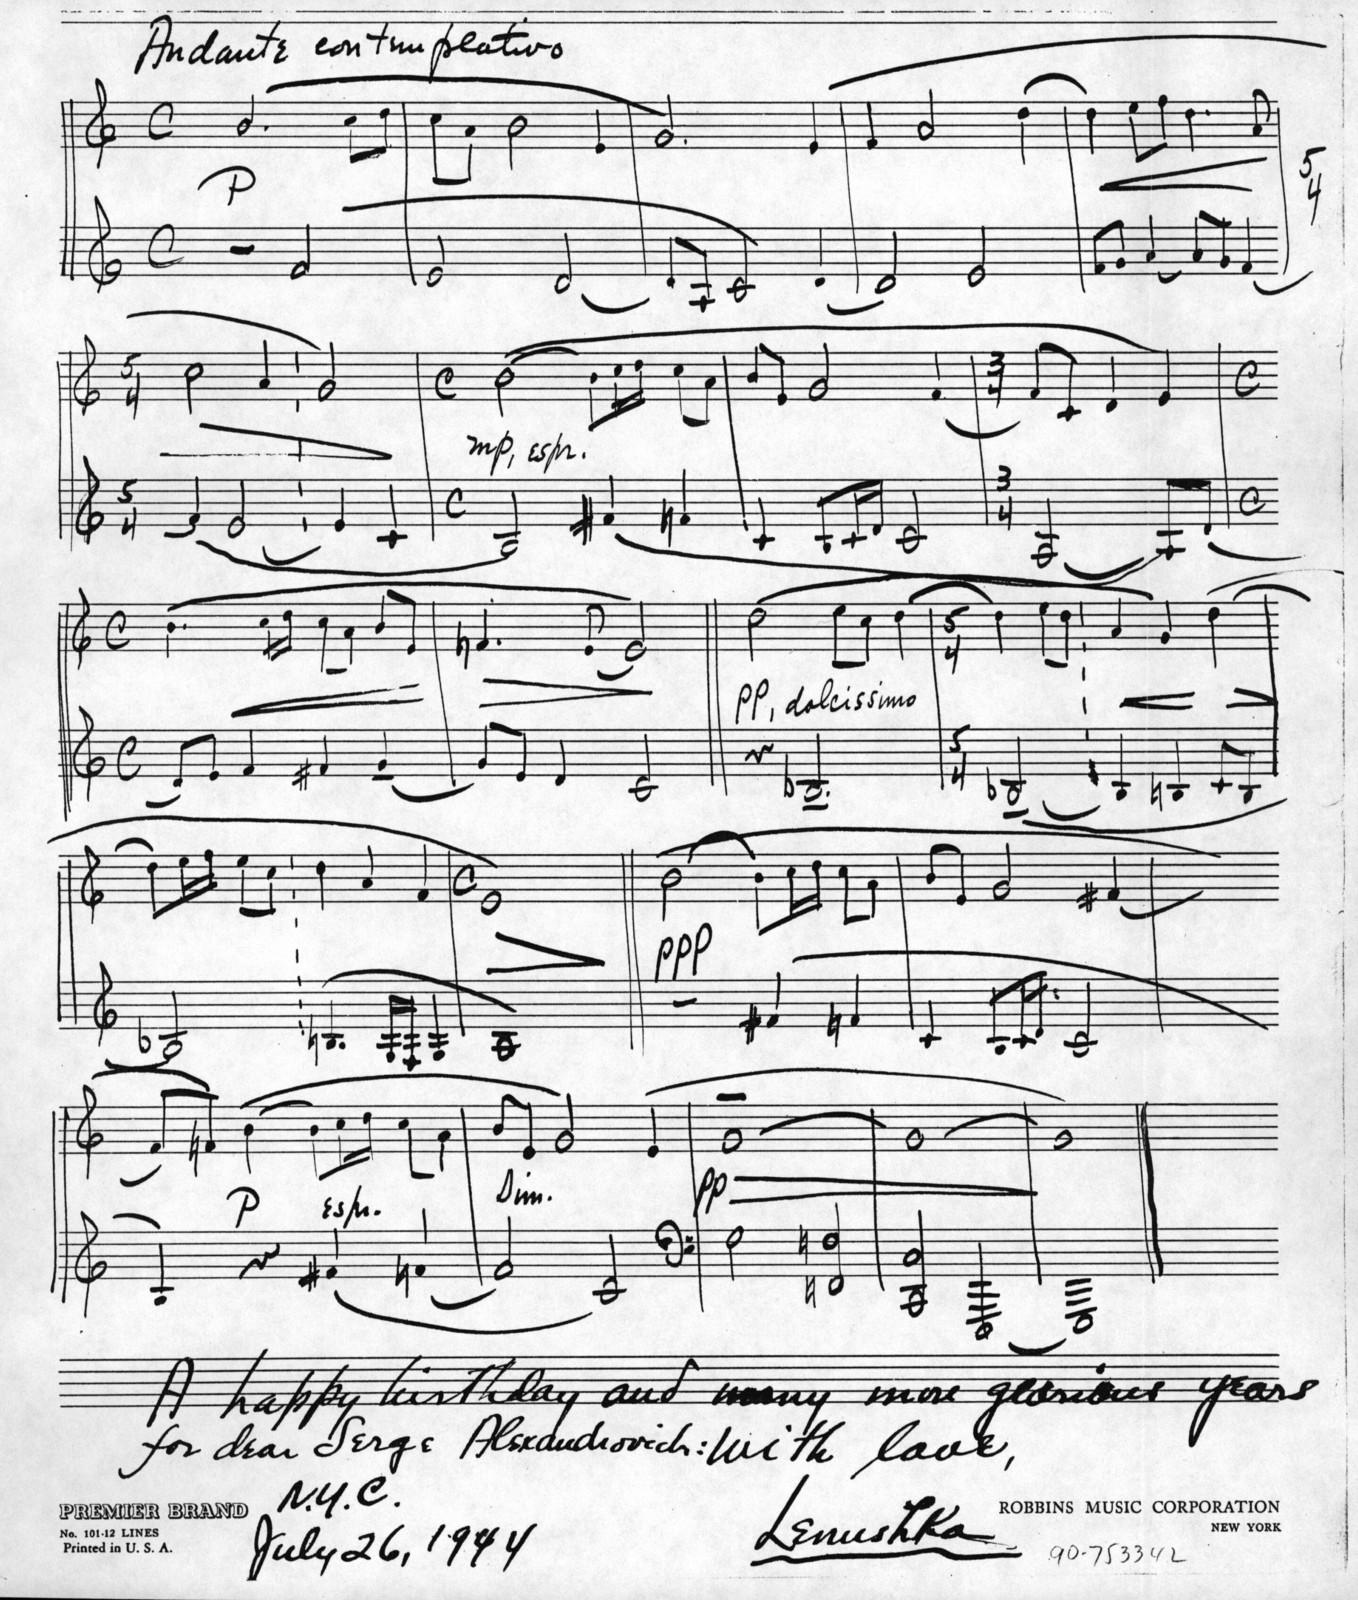 Letter from Leonard Bernstein to Serge Koussevitzky, July 25, 1944